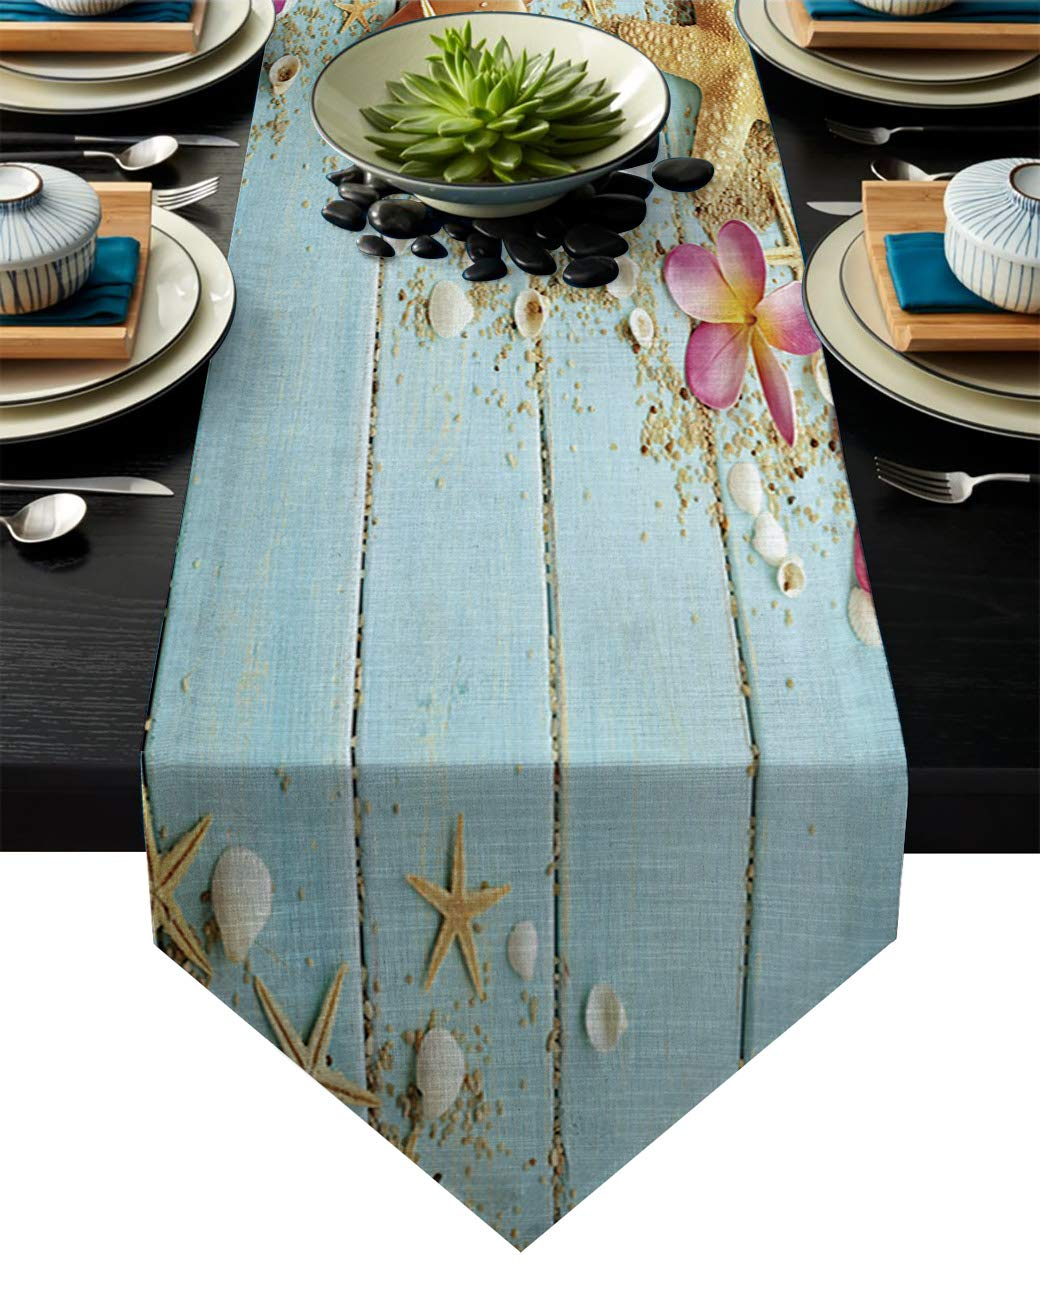 "Vandarllin Cotton Linen Table Runner Dresser Scarves Beach Theme Seashells&Blue Rustic Wood Non-Slip Burlap Table Setting Decor for Wedding Party Holiday Dinner Home, 13""x70"""